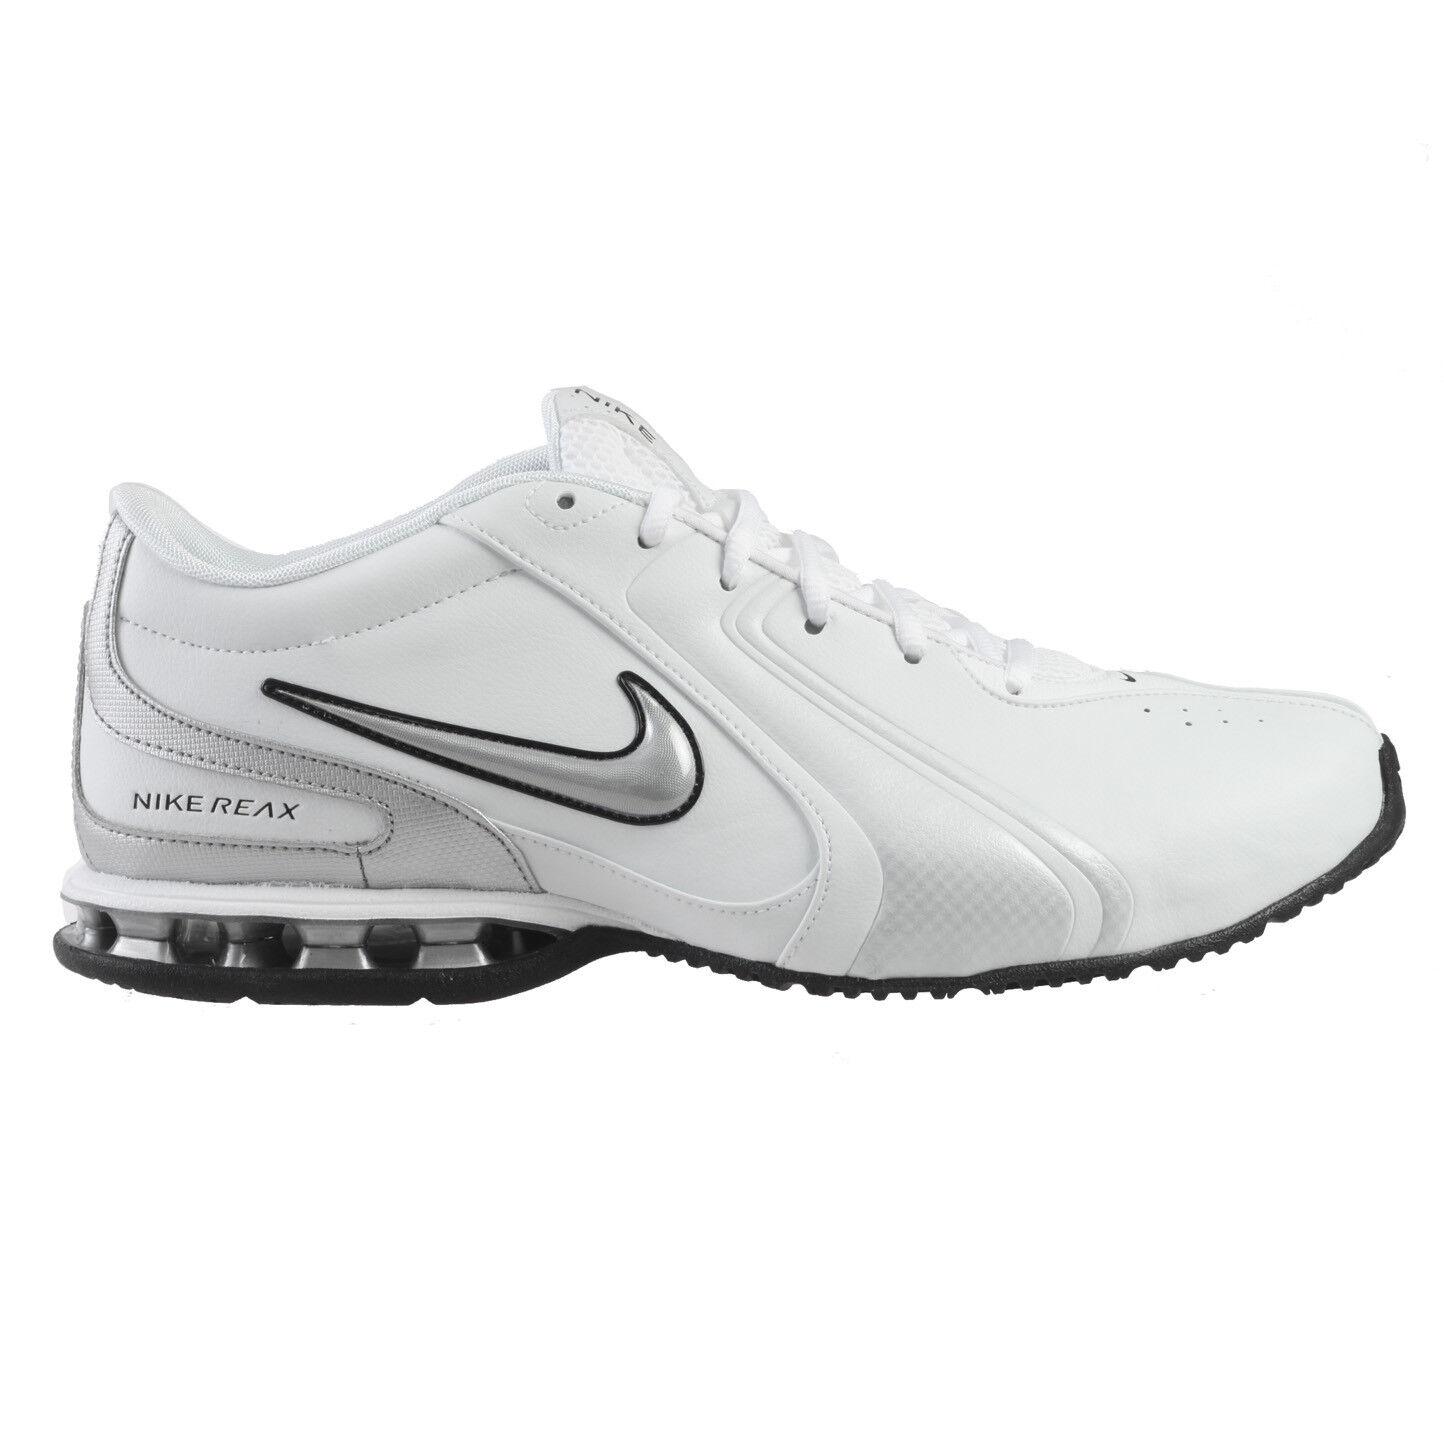 Nike reax tr iii sl d'argento Uomo 333765-101 bianca croce d'argento sl formazione scorpe 9,5 b2ff22